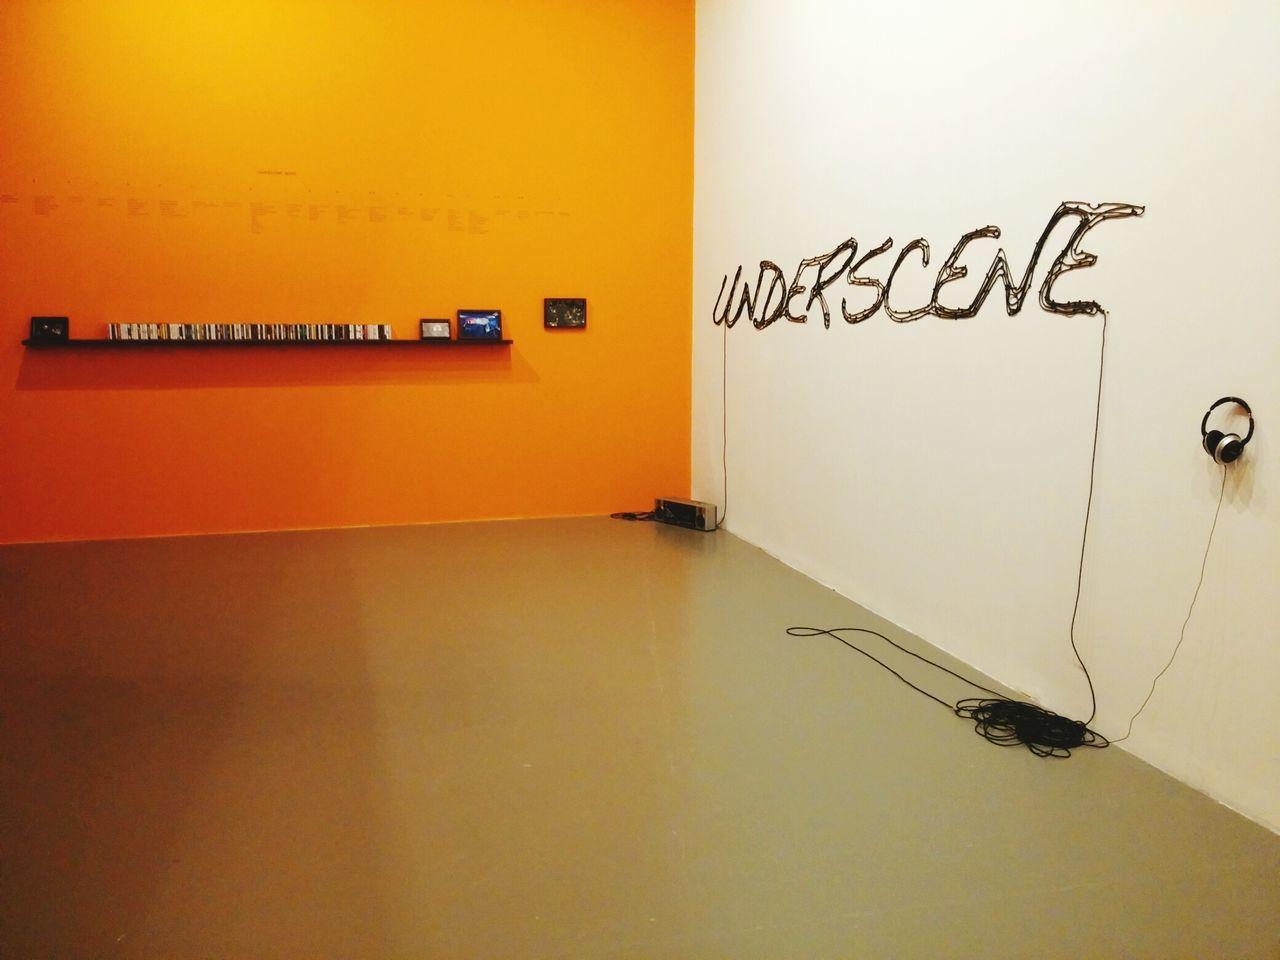 Listening To Music Music Museum Orange OpenEdit Turkey Istanbulmodern Underscene Stereo Room#art